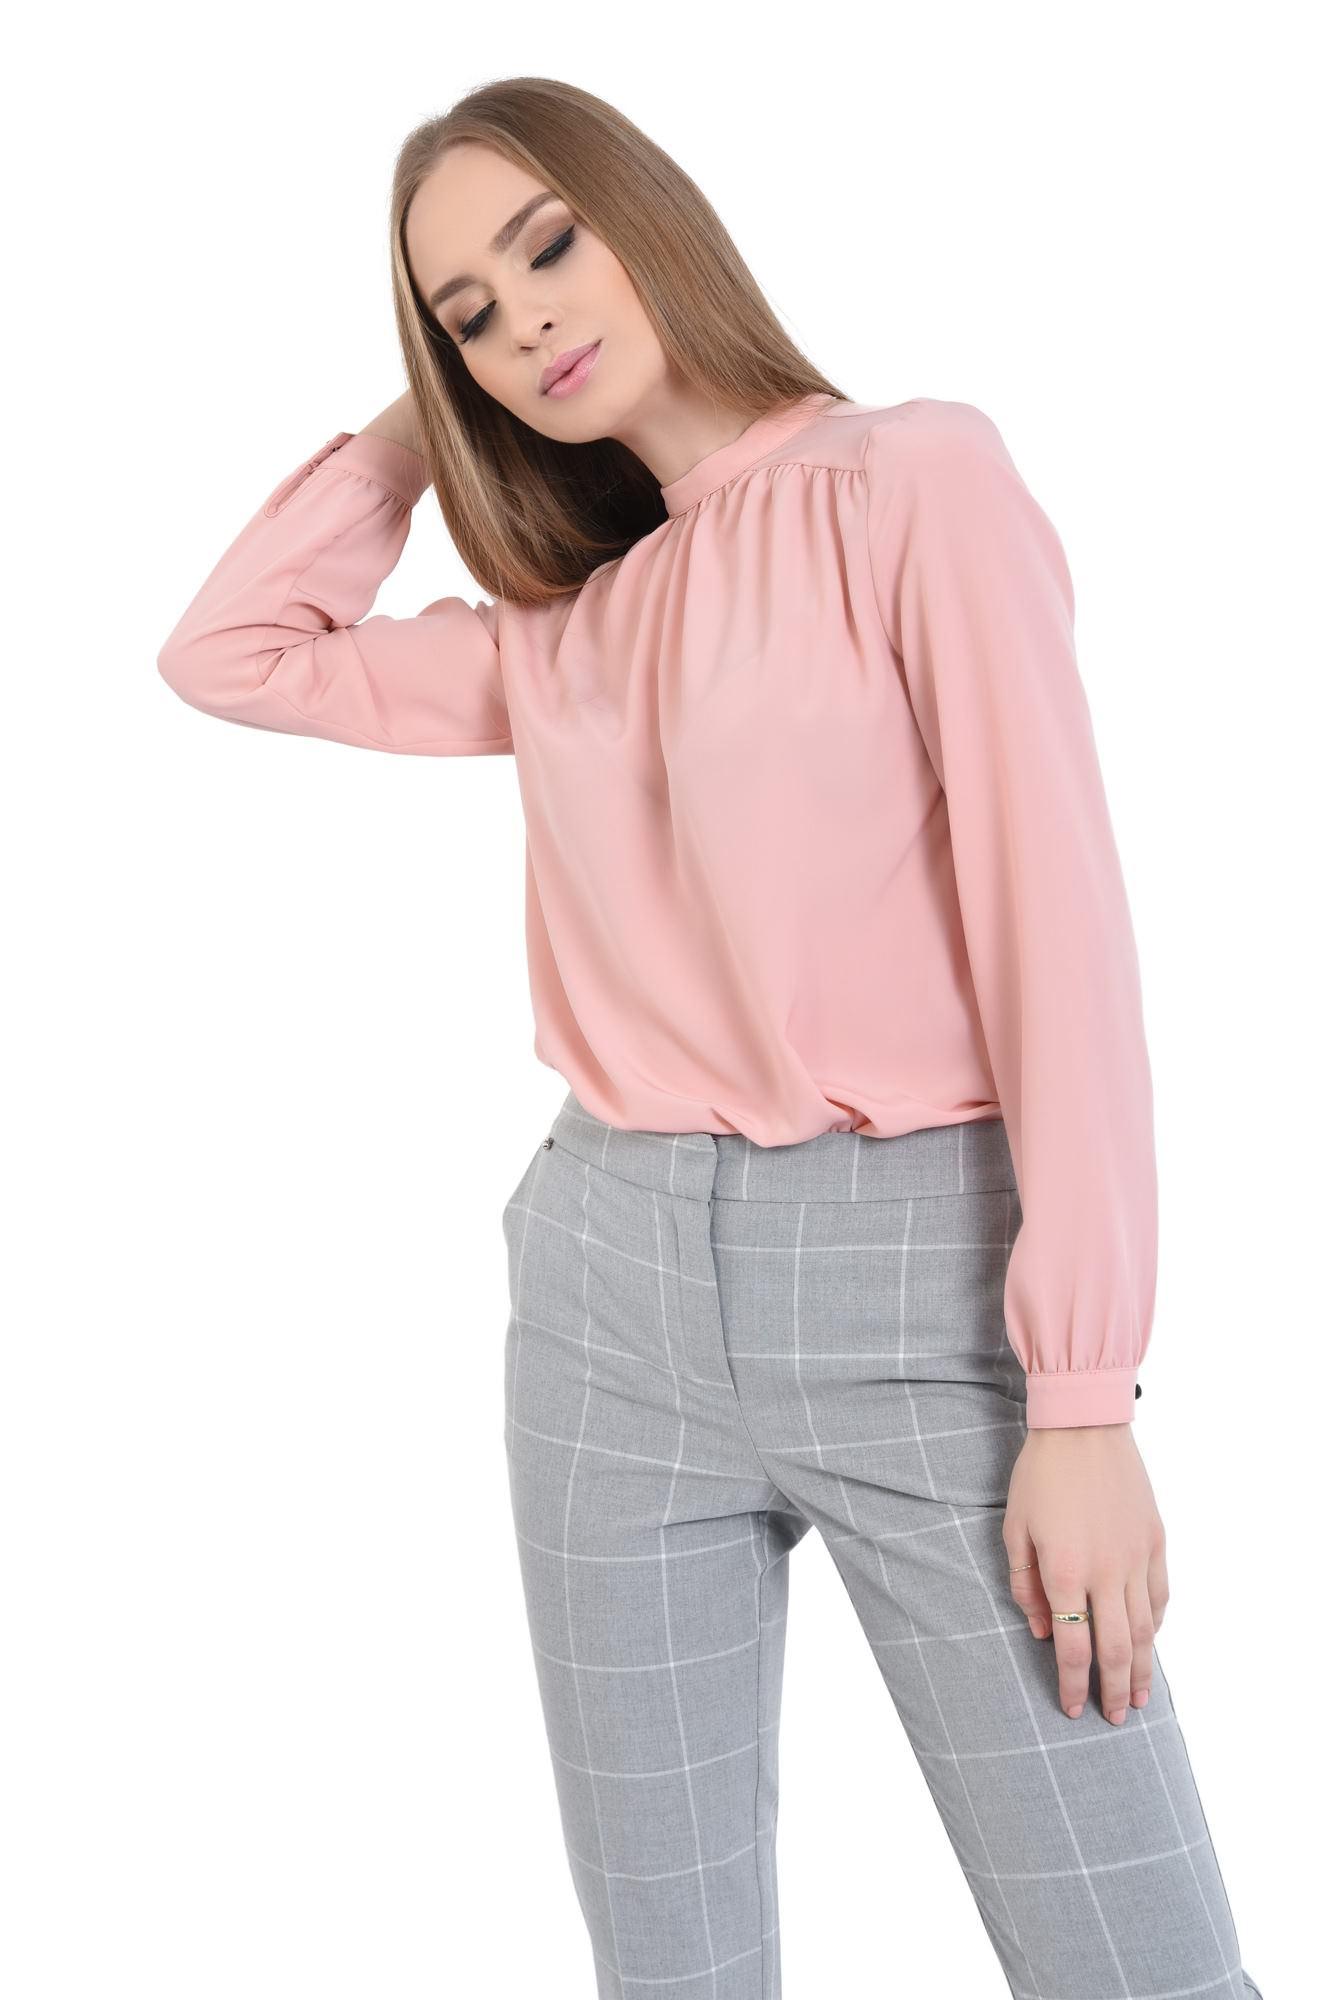 bluza roz, maneci bufante, cu mansete